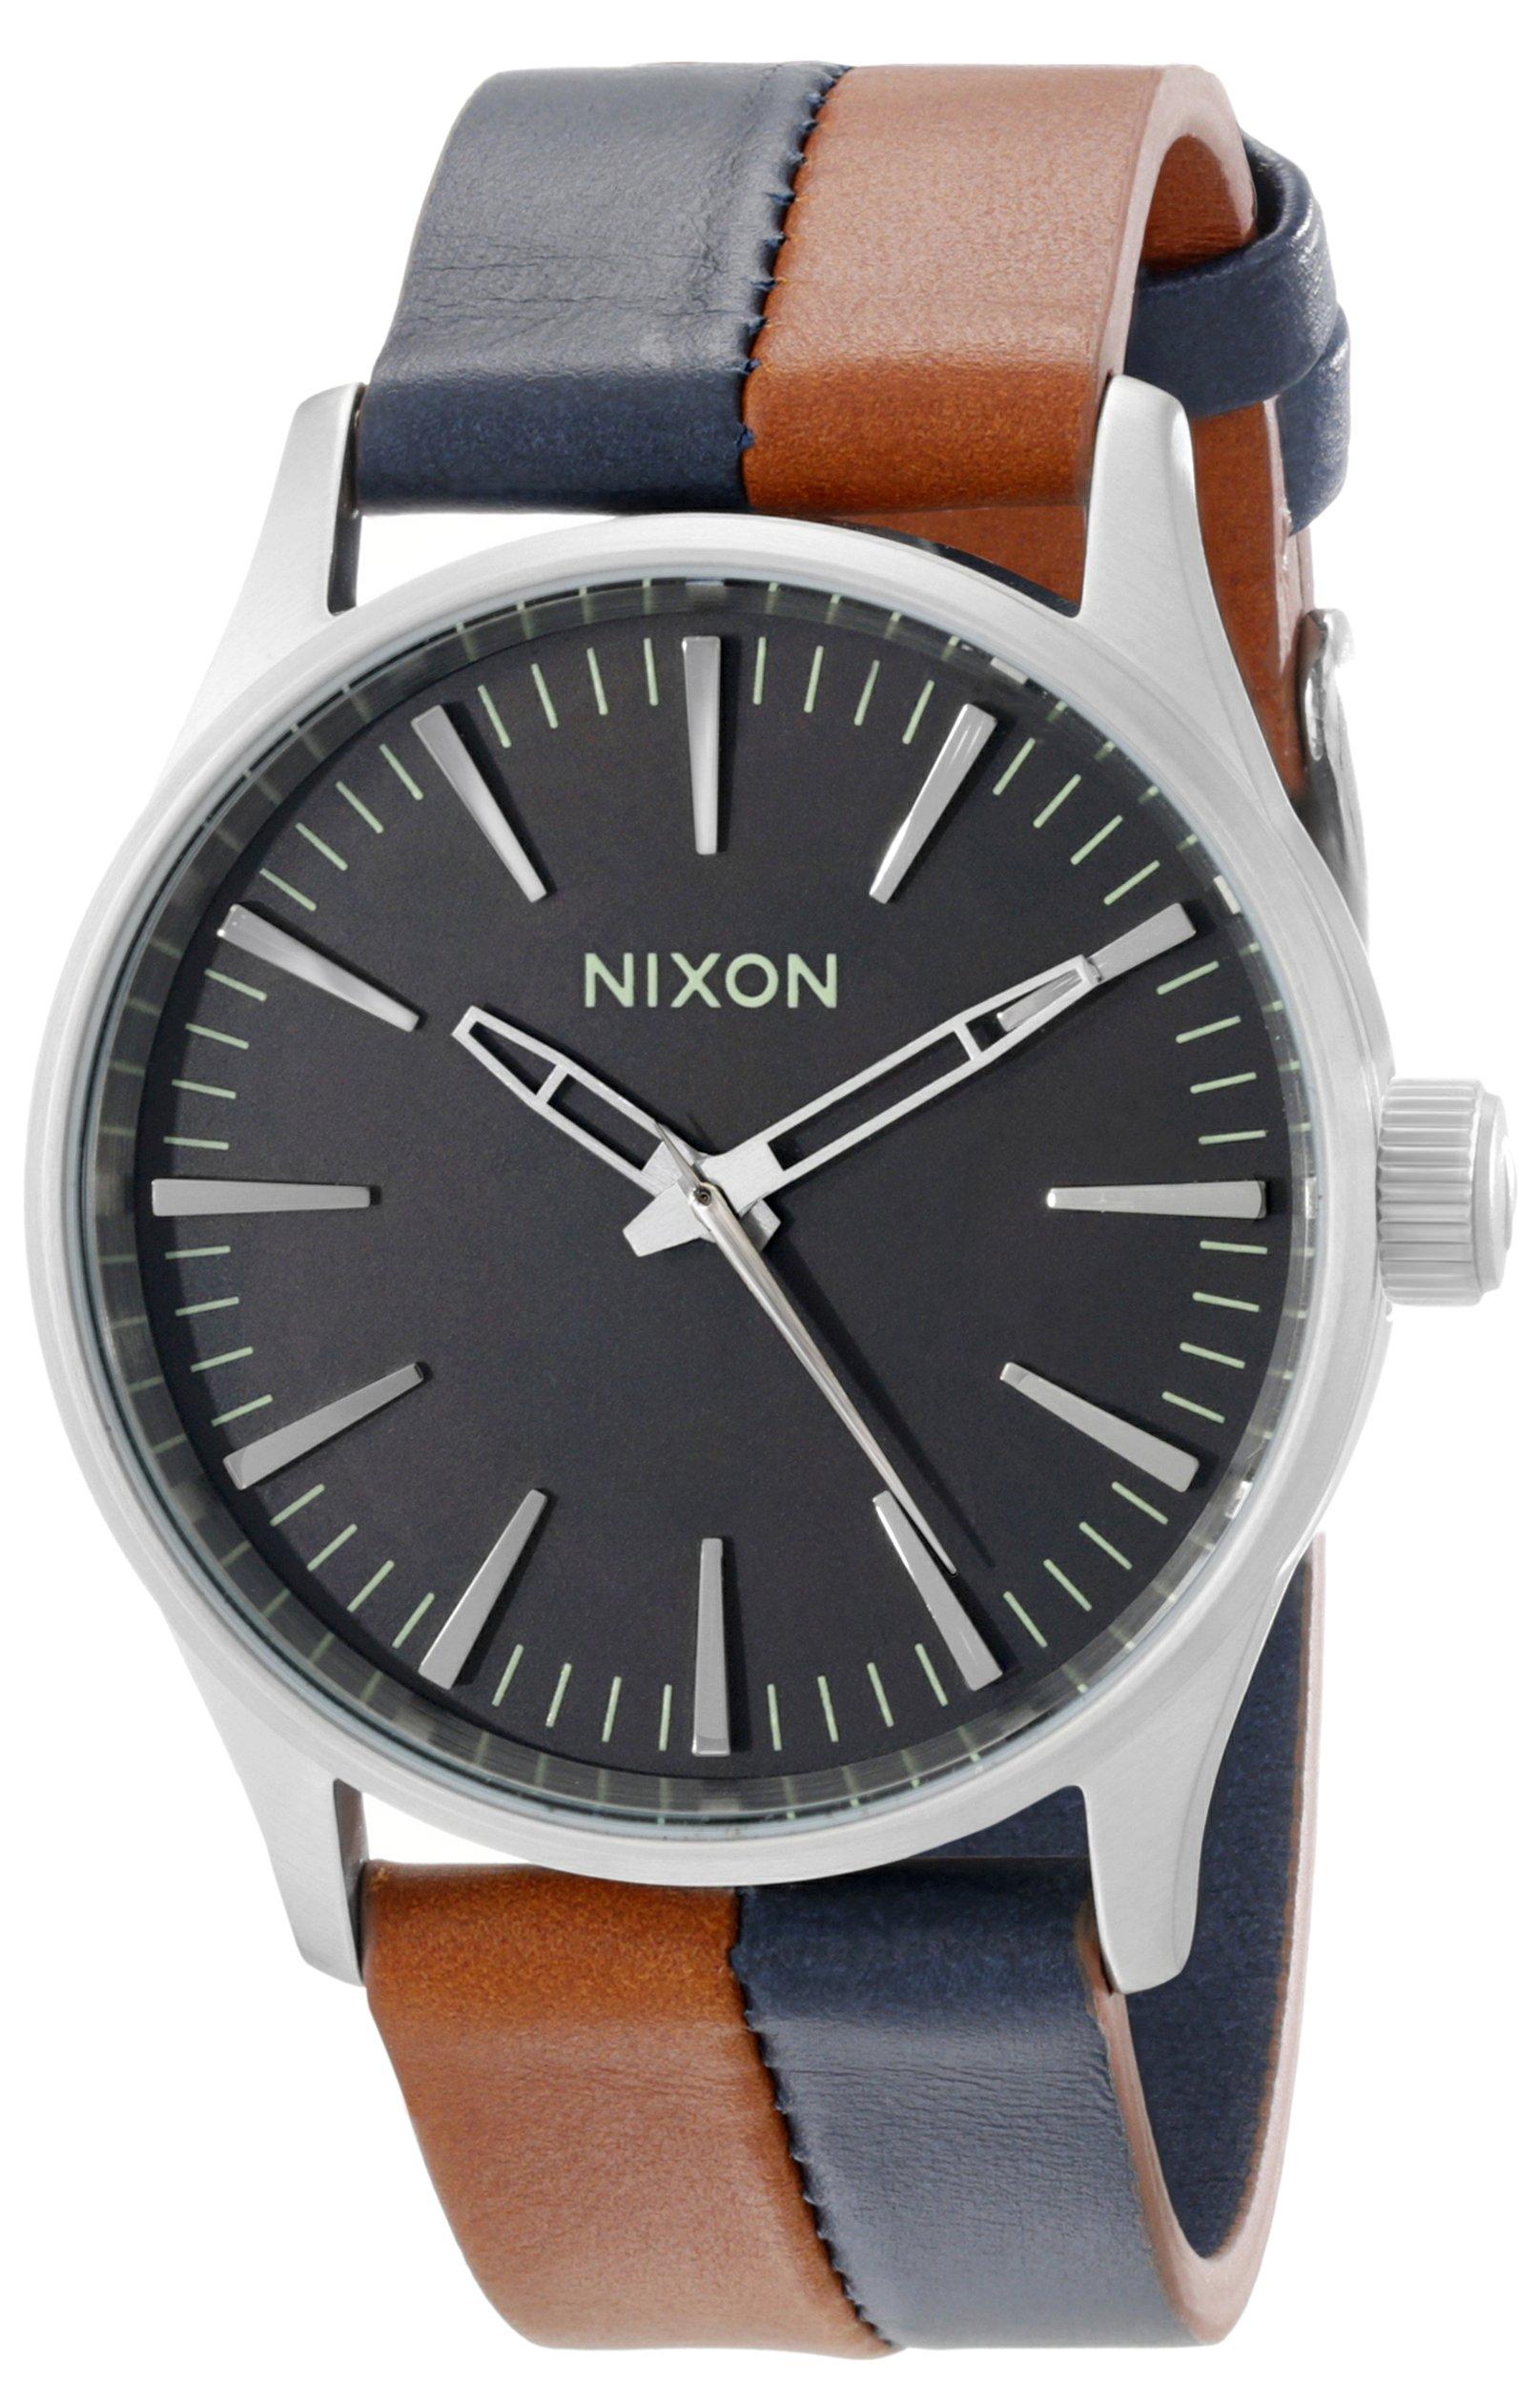 Nixon Men's A3771957 Sentry 38 Leather Watch by NIXON